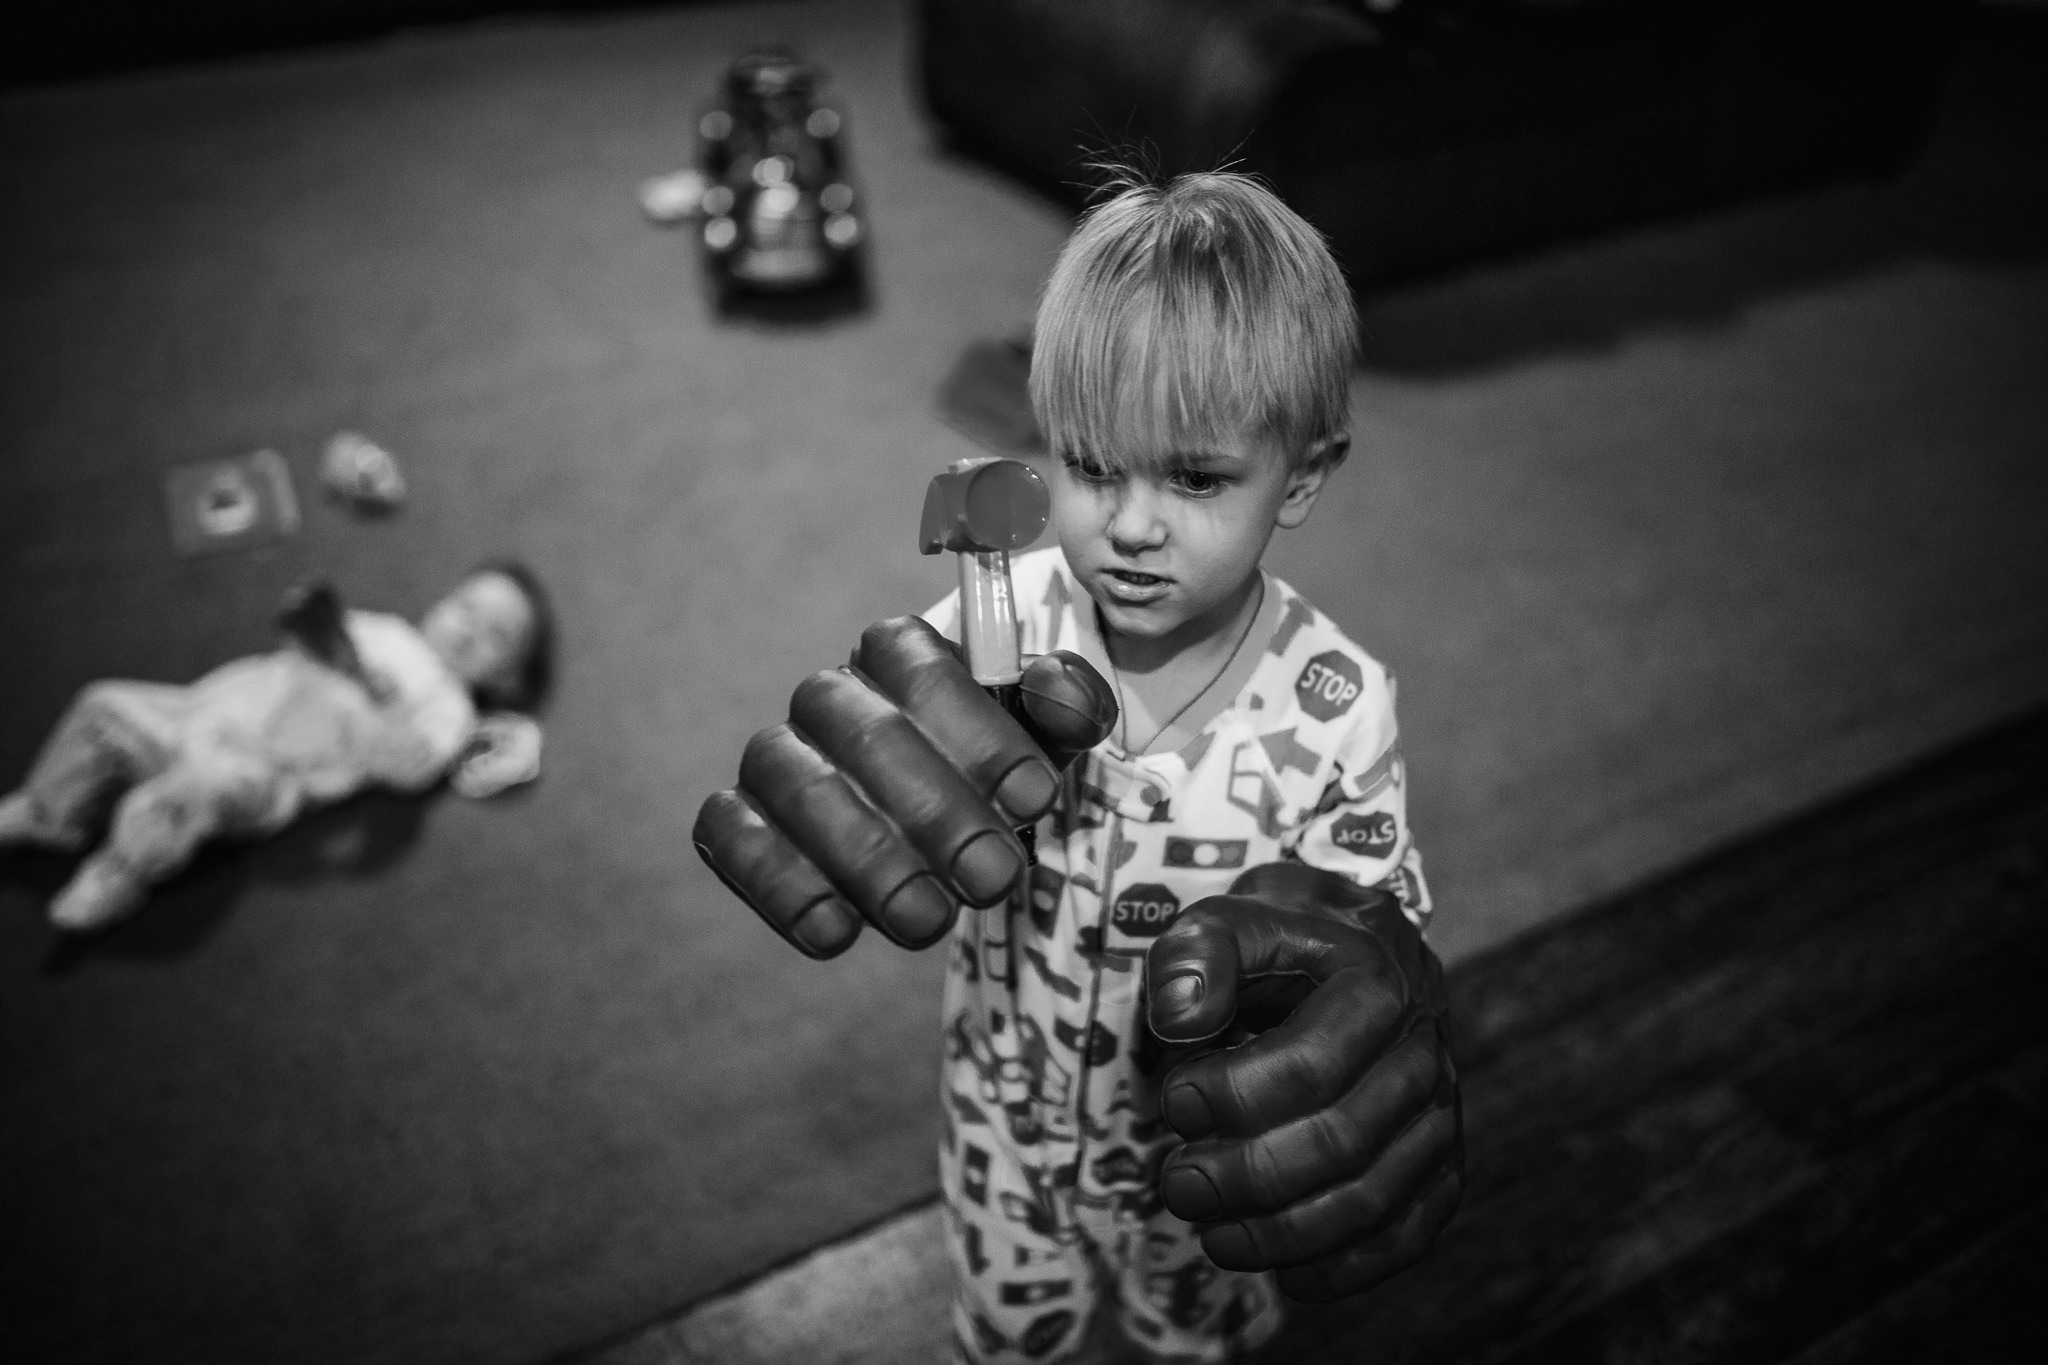 Hammering with Hulk hands.